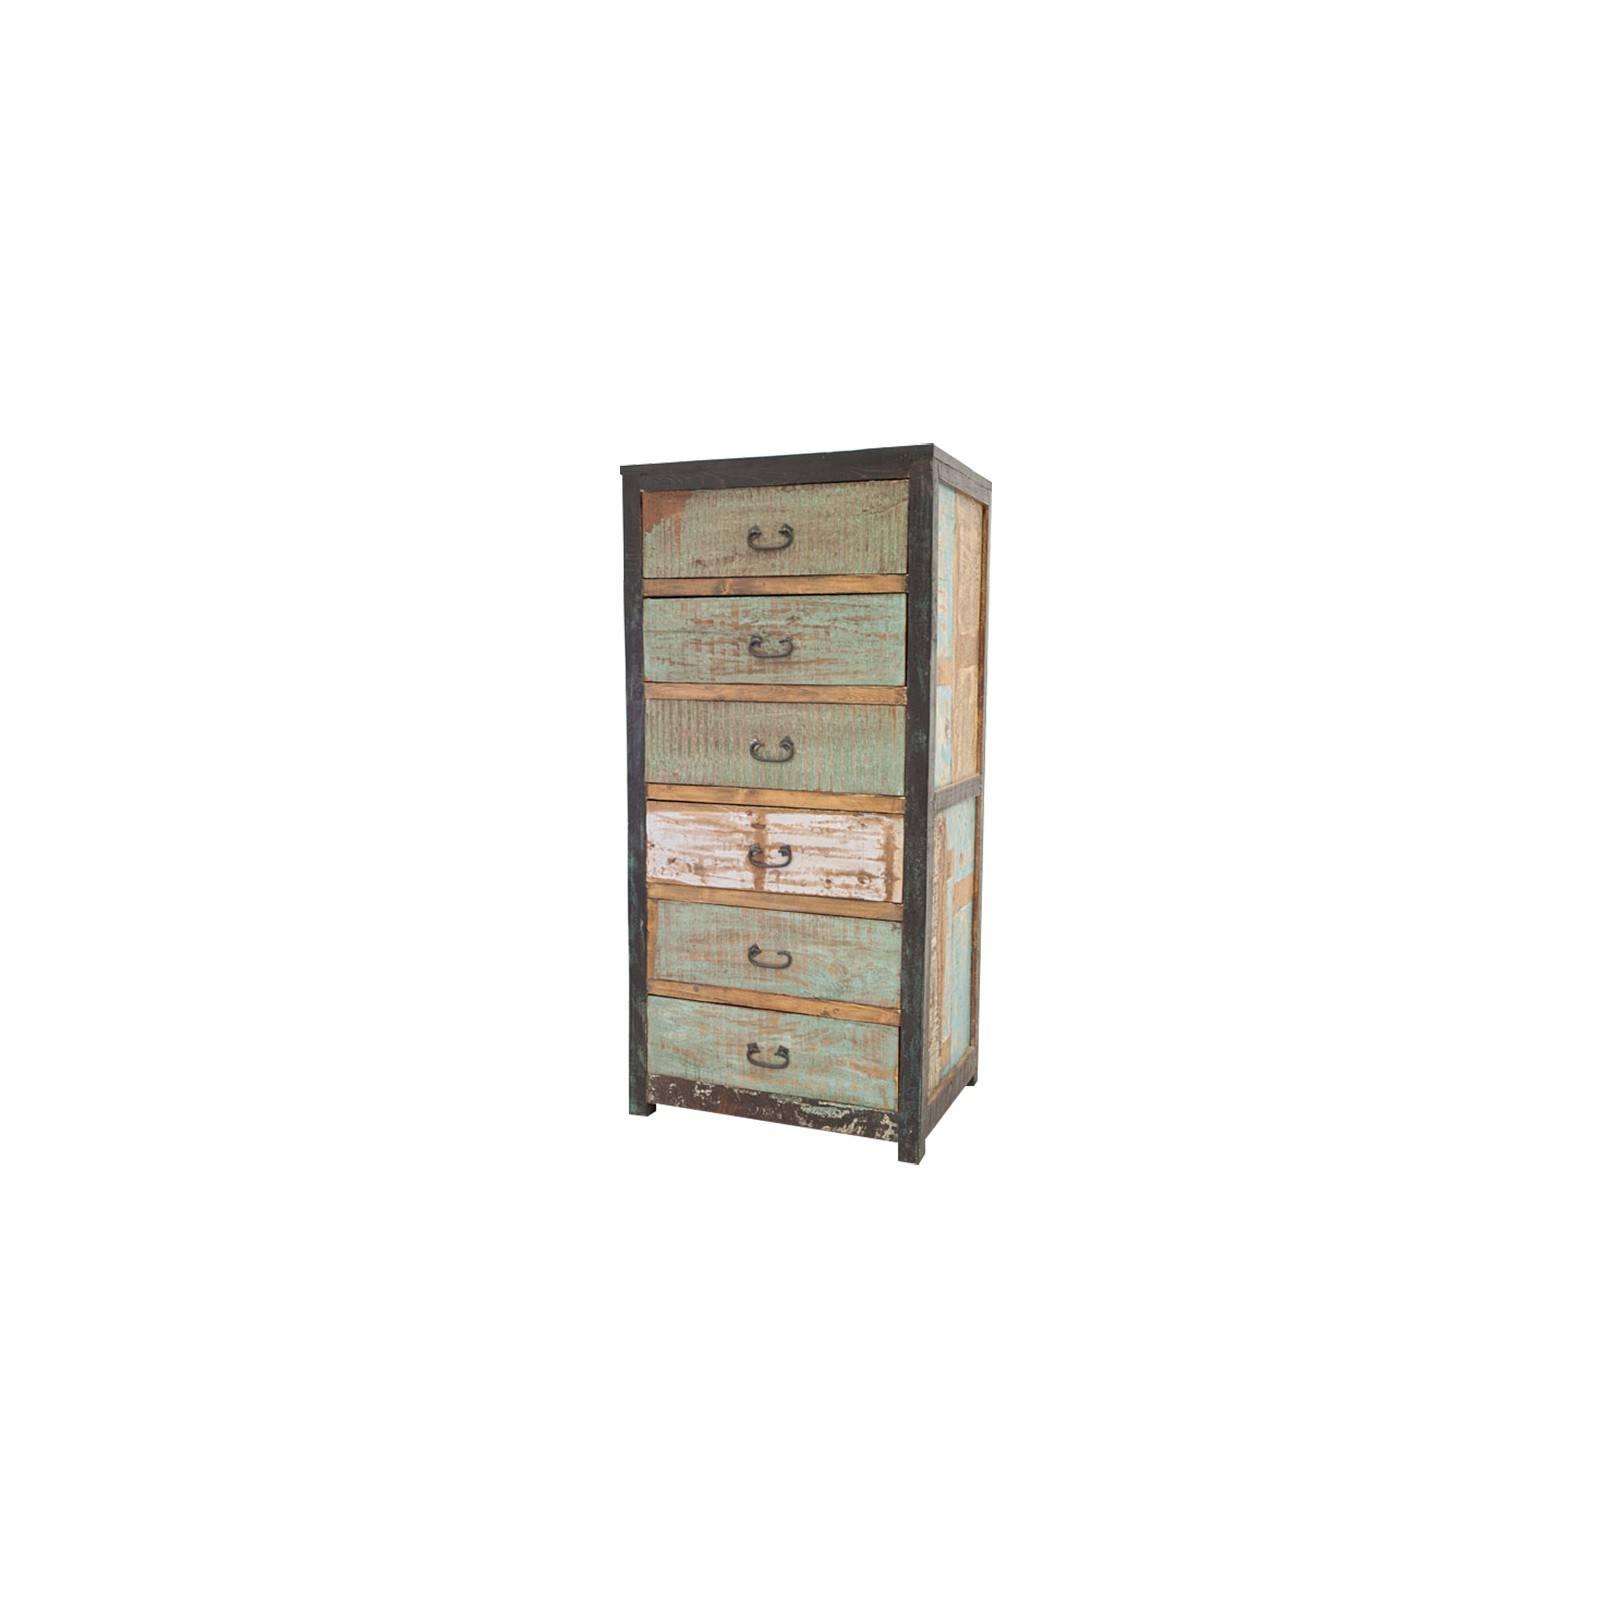 Chiffonnier en bois recyclé et au style industriel Butterfly